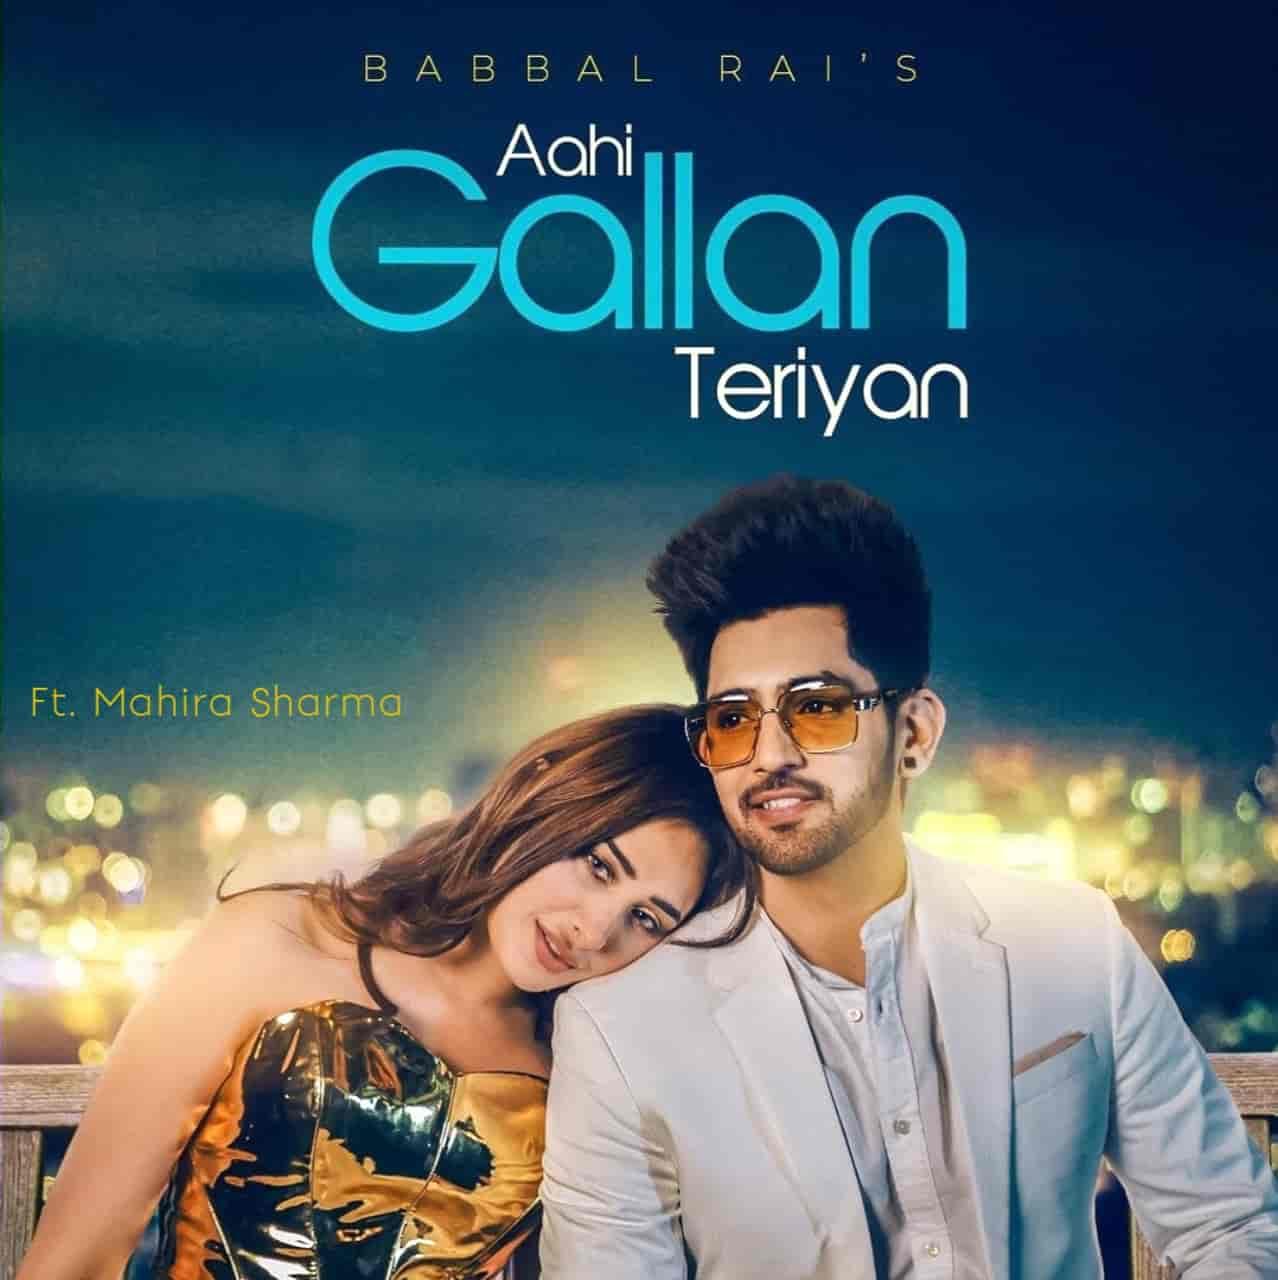 Aahi Gallan Teriyan Lyrics Babbu Rai